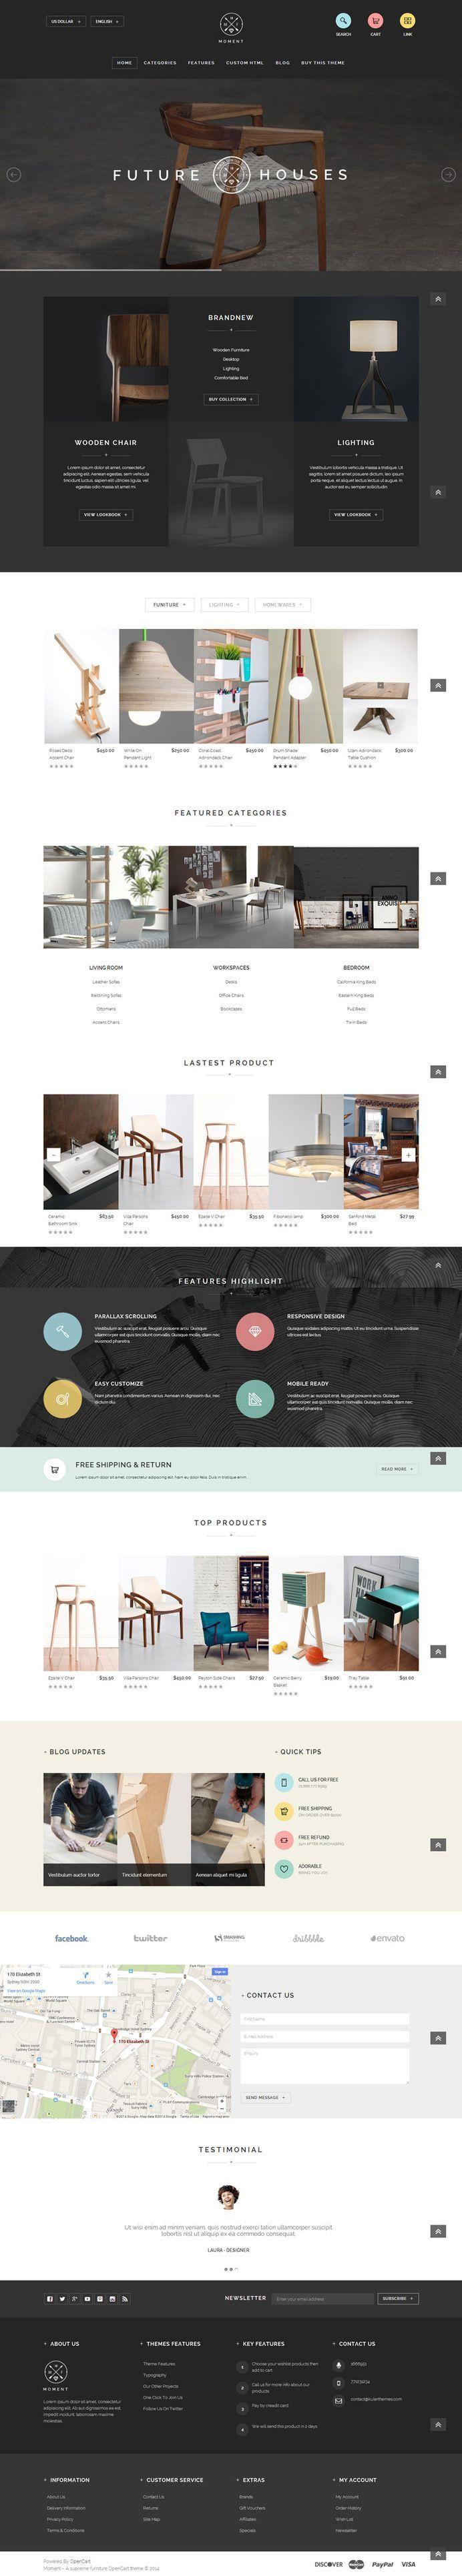 20 Clean Web Design Inspiration 2015 Clean Web Design Clean Web Design Inspiration Web Design Inspiration